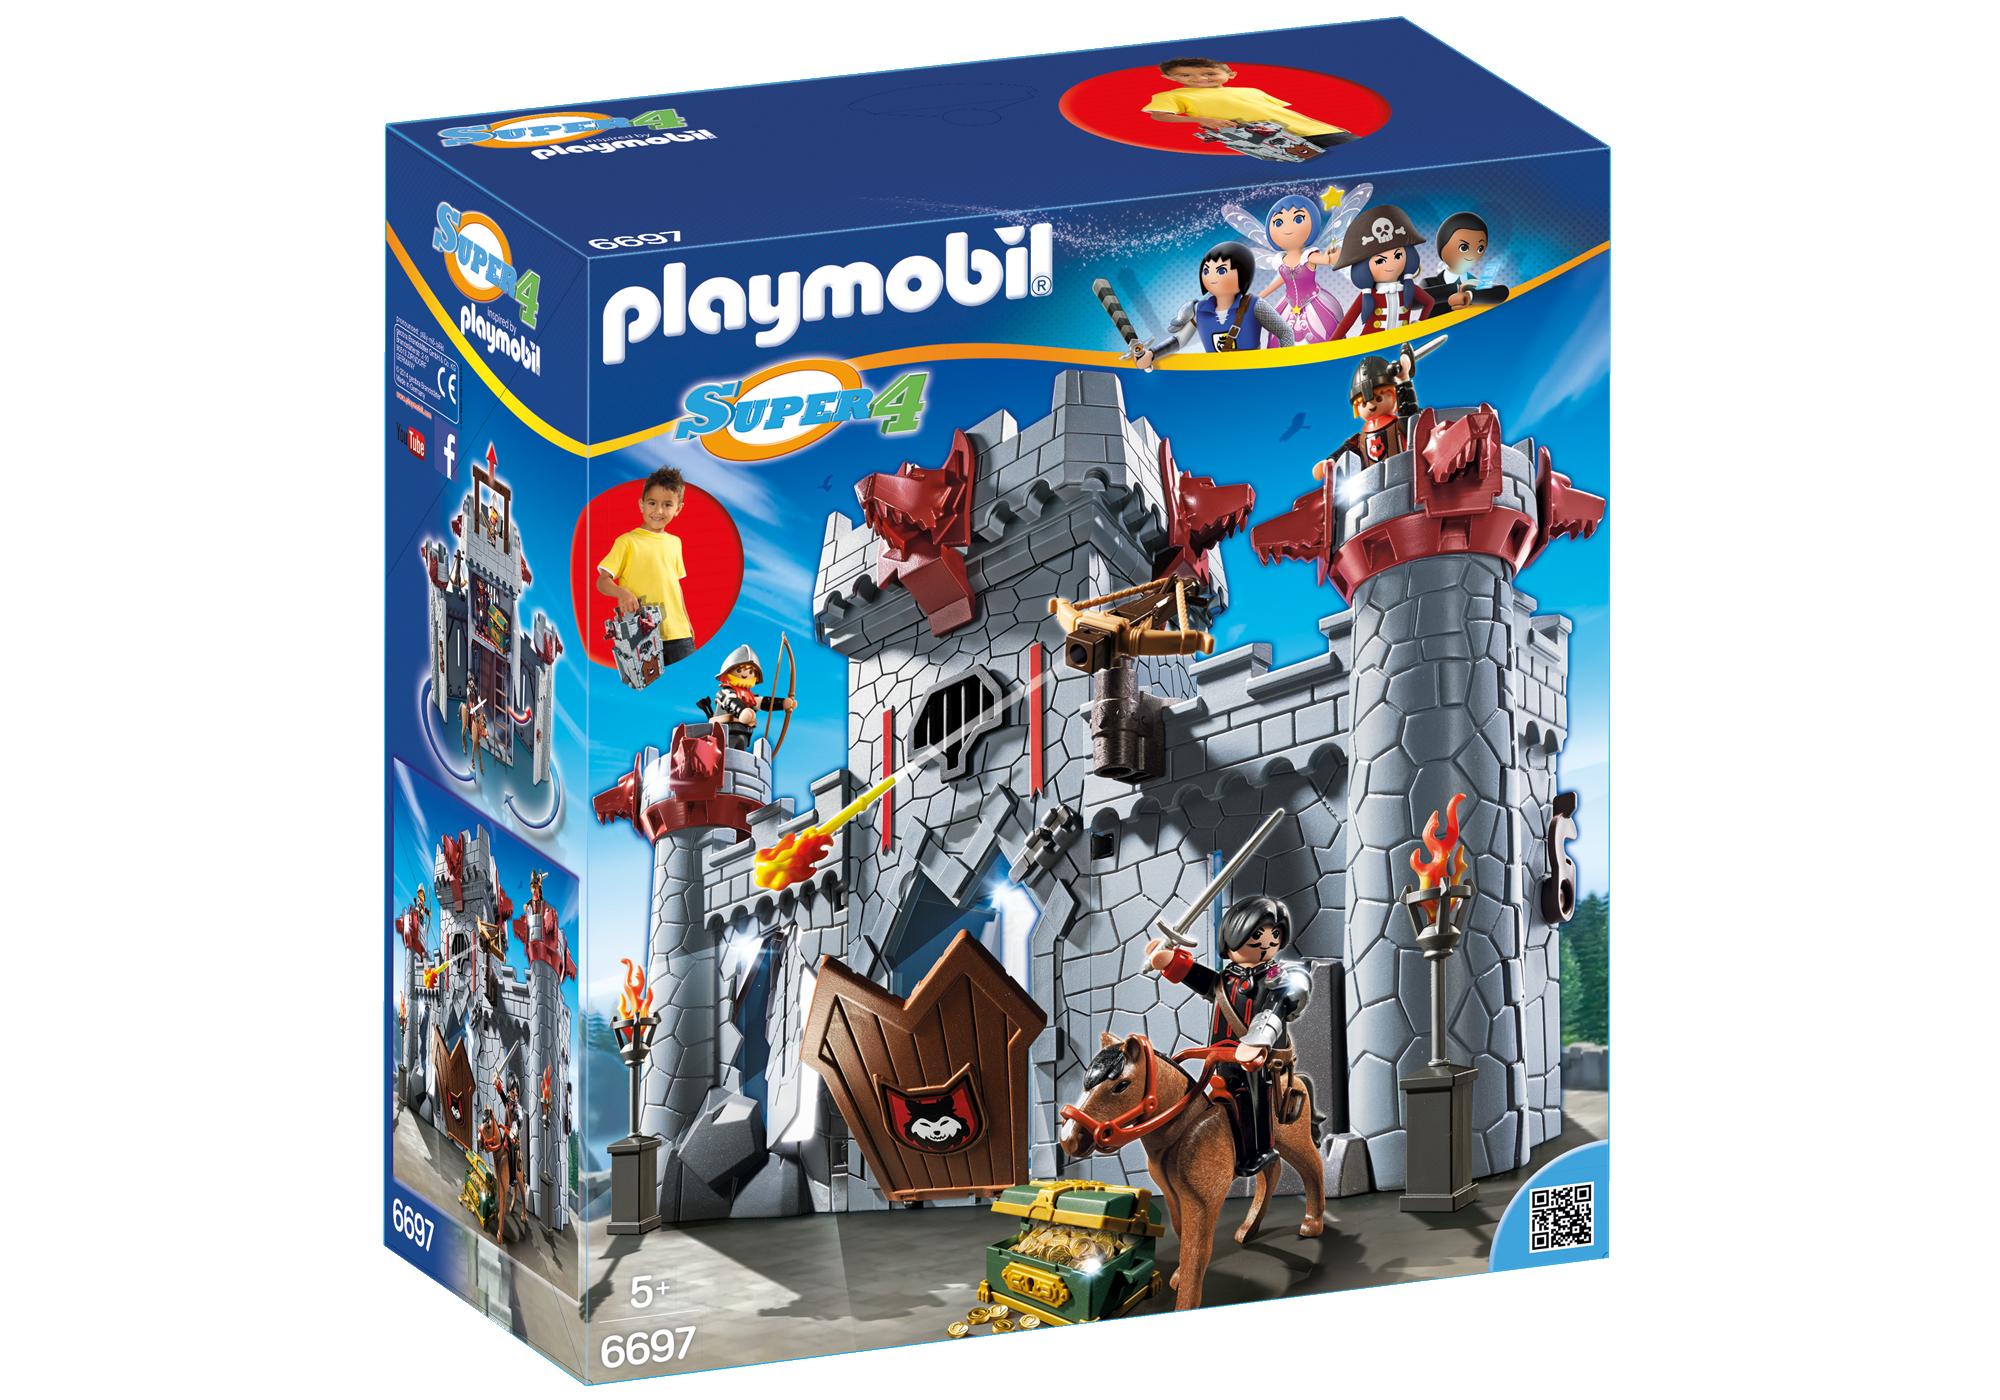 http://media.playmobil.com/i/playmobil/6697_product_box_front